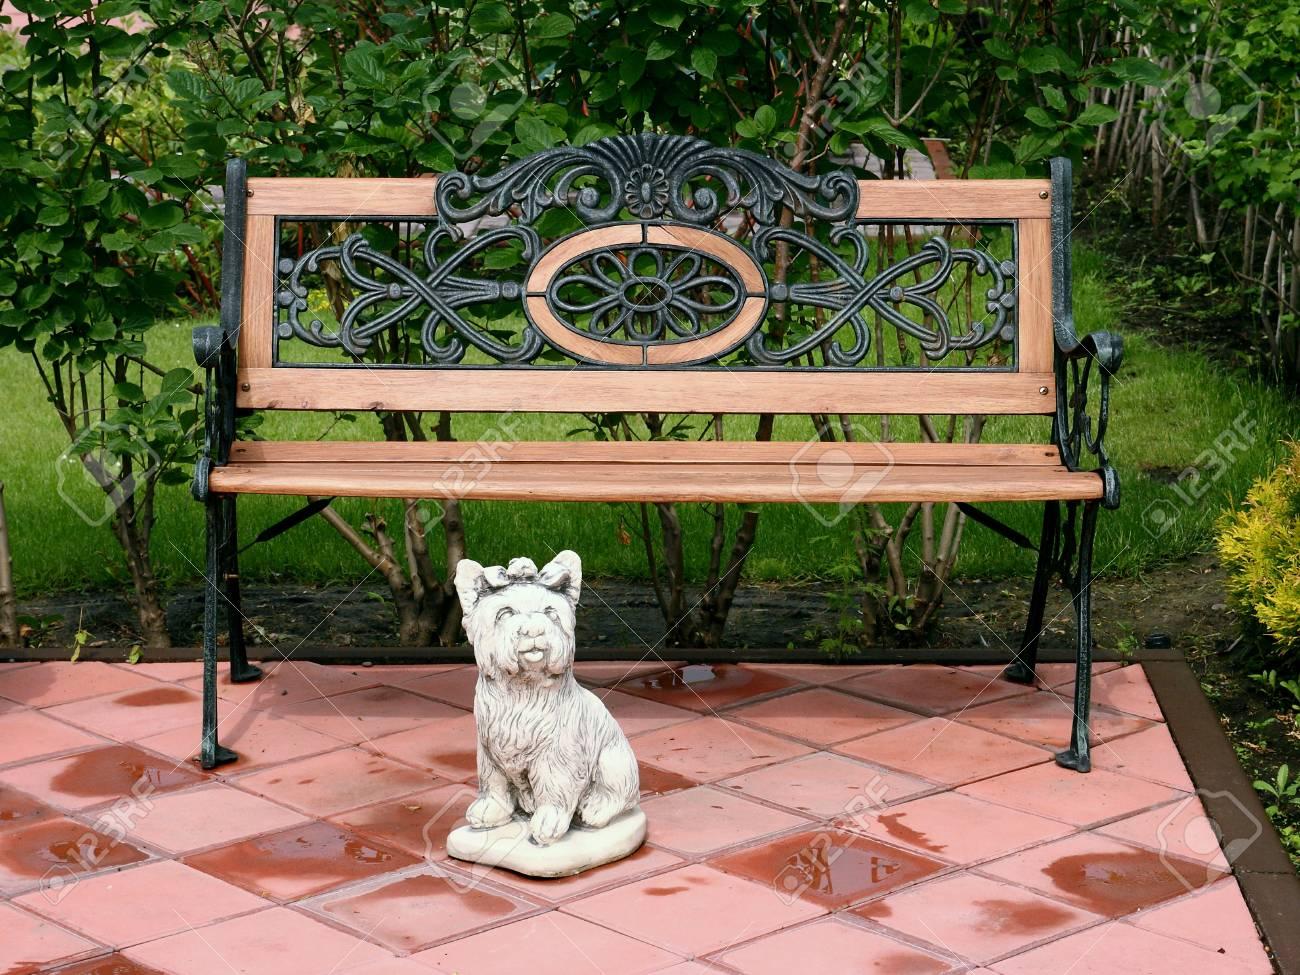 Peachy A Bench And A Sculpture Of A Small Dog In The Park Frankydiablos Diy Chair Ideas Frankydiabloscom